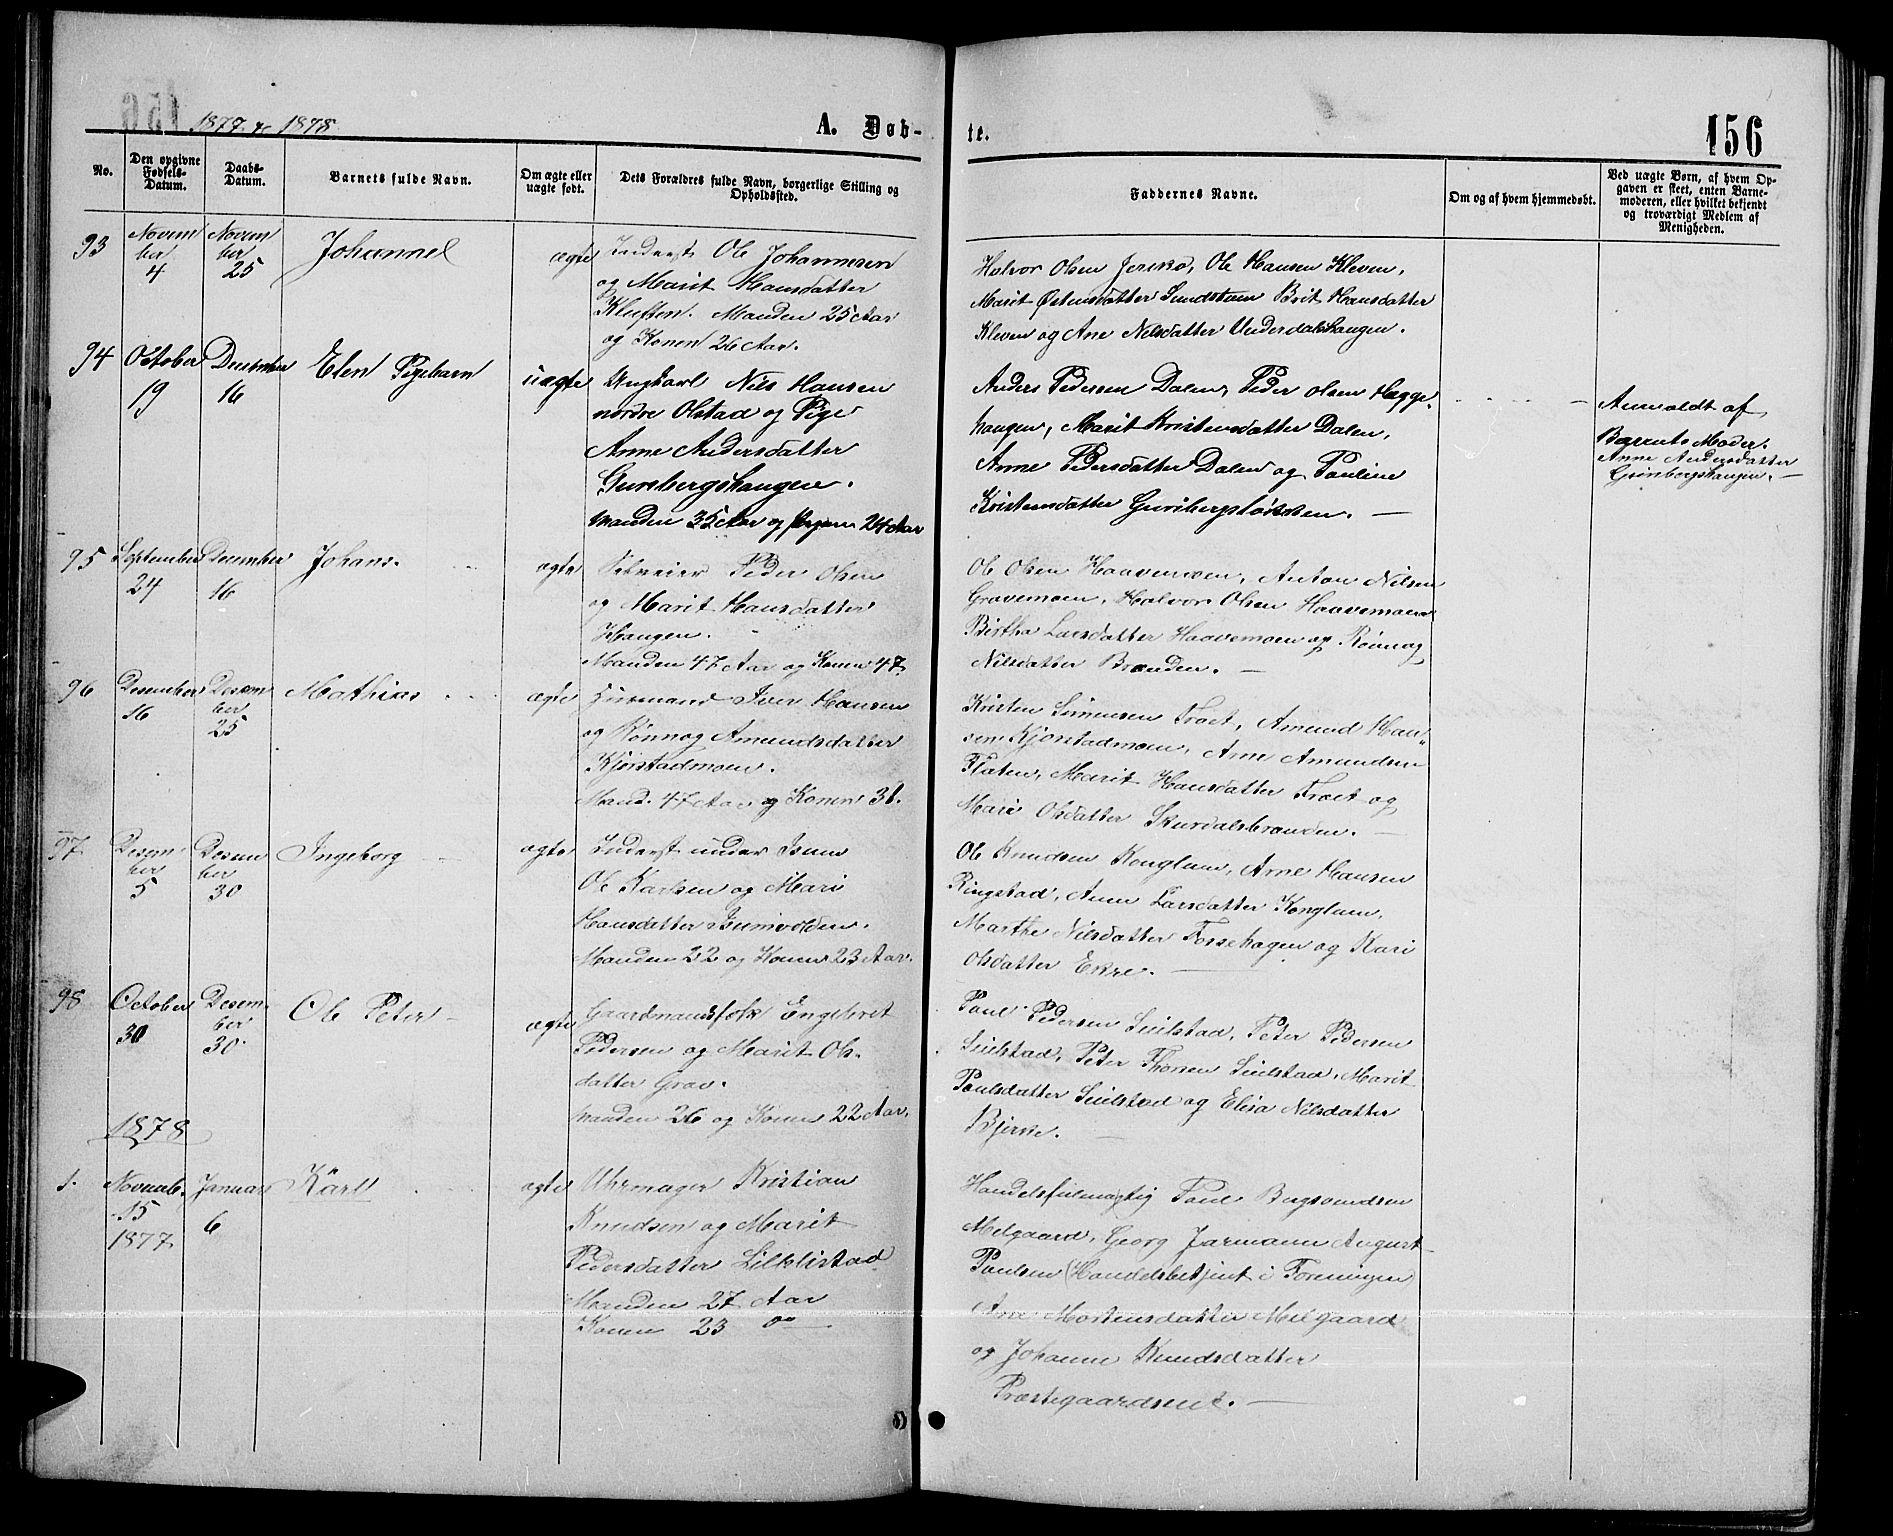 SAH, Sør-Fron prestekontor, H/Ha/Hab/L0002: Klokkerbok nr. 2, 1864-1883, s. 156